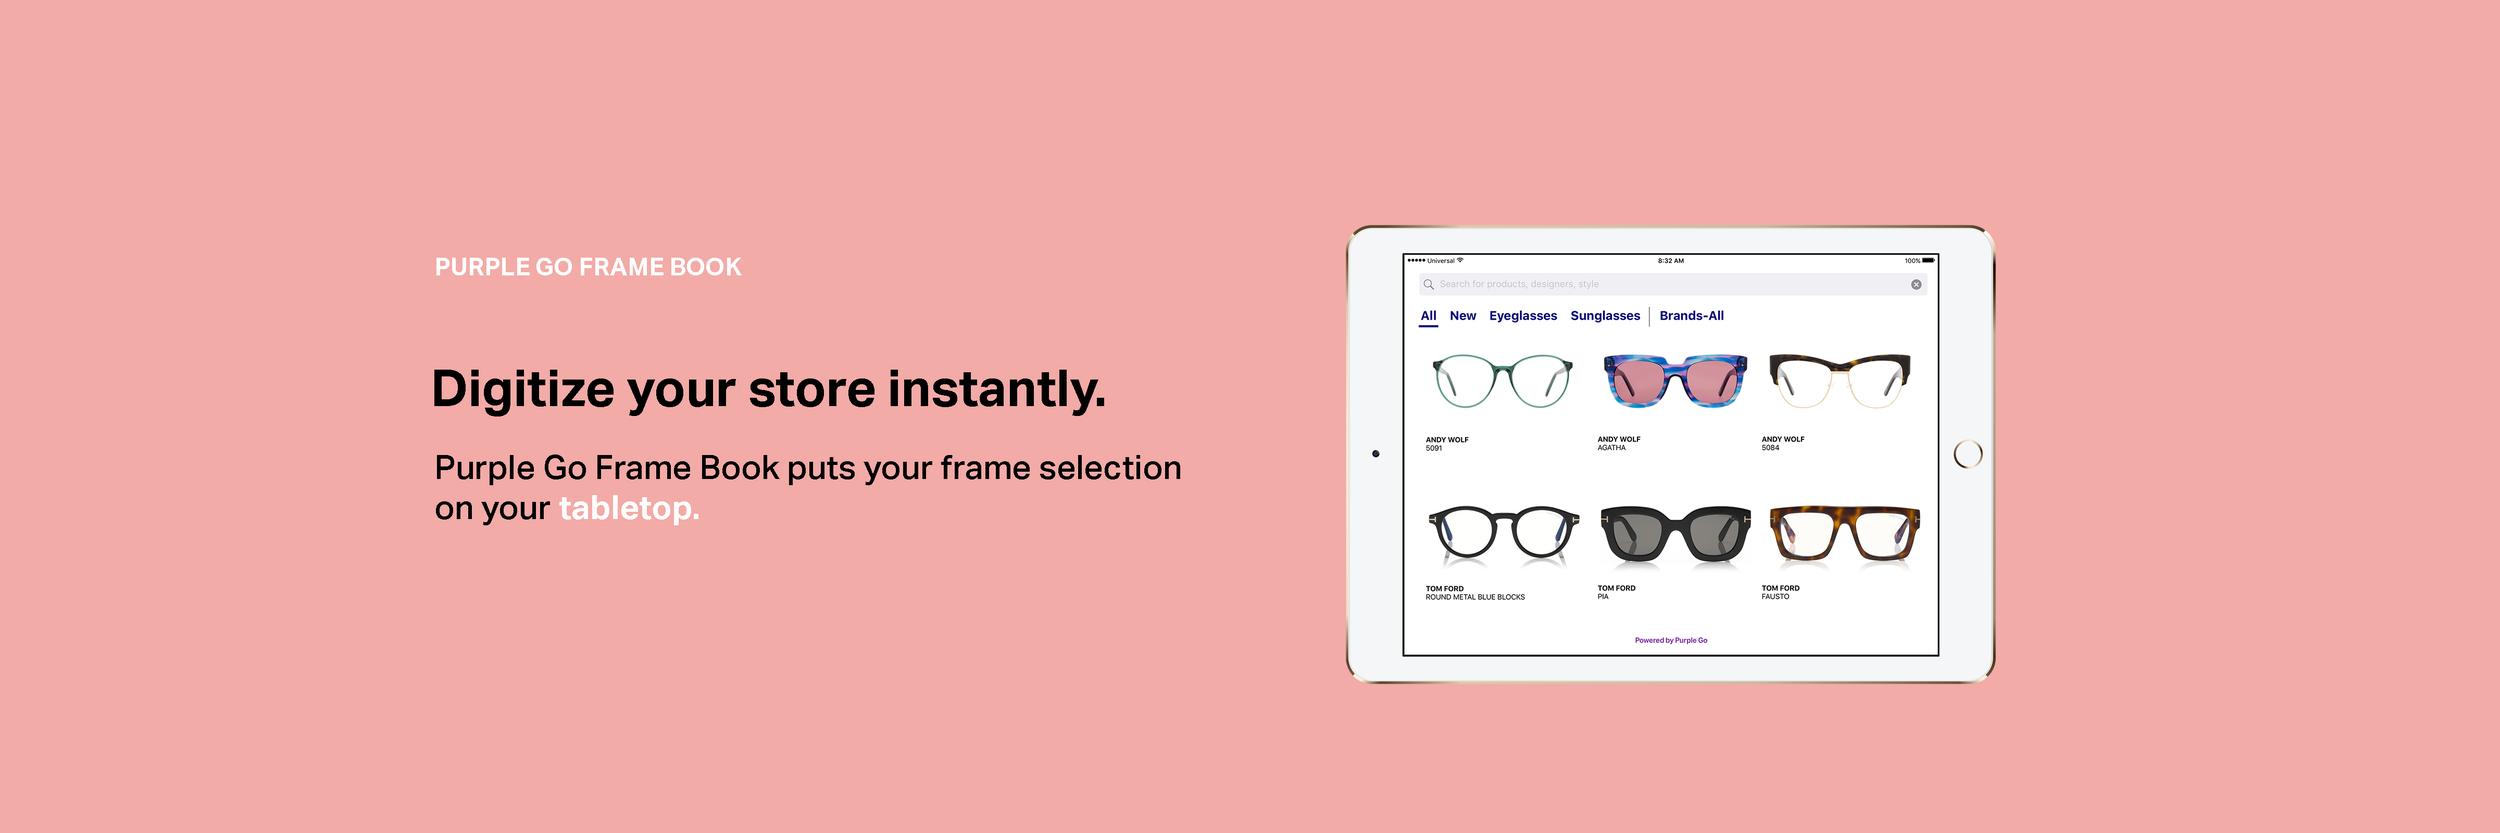 Purple-Go-Frame-Book---iPad.png